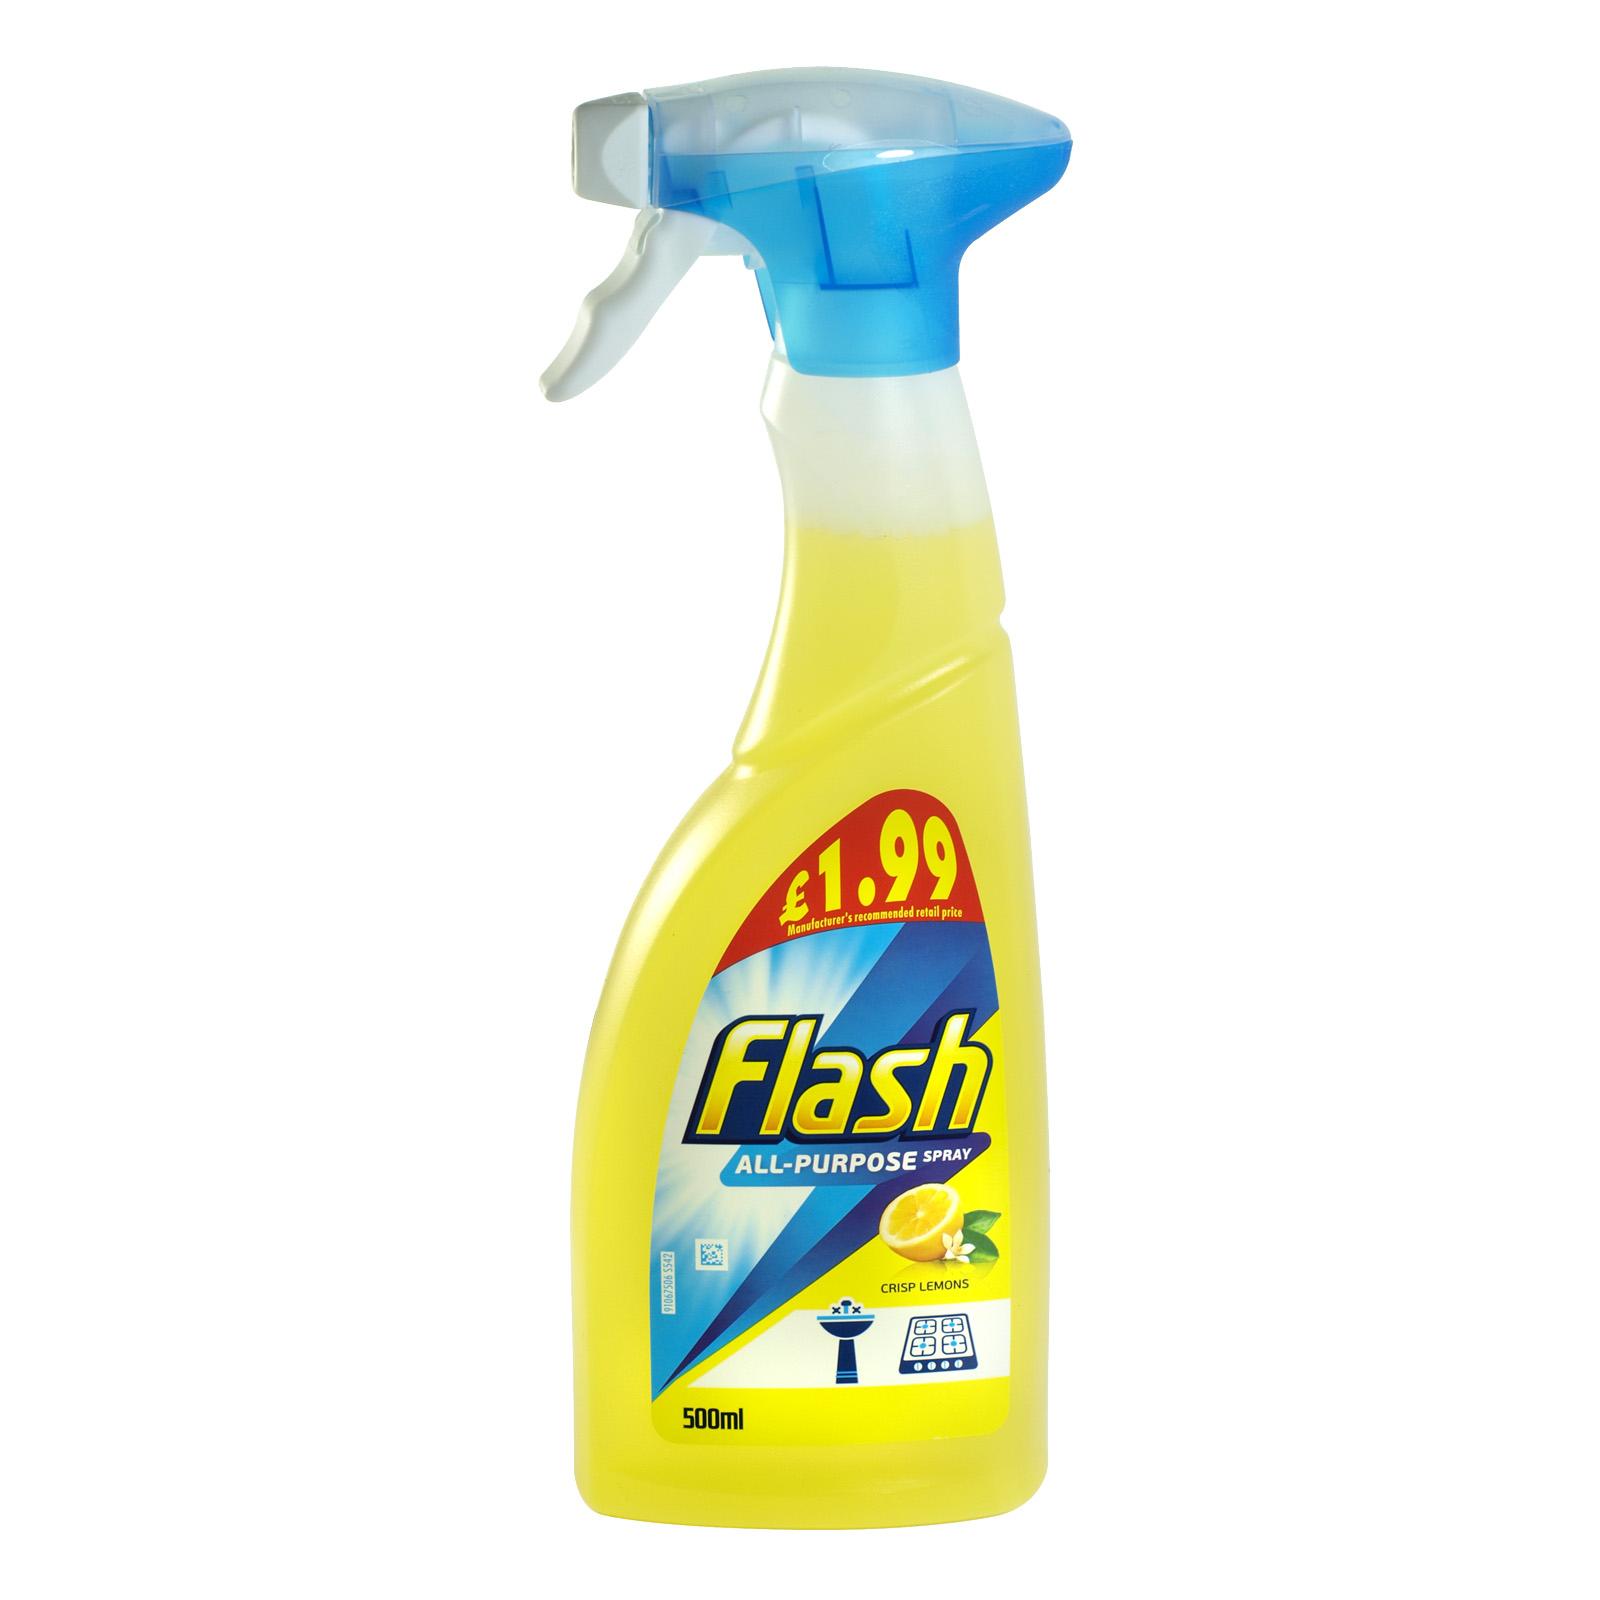 FLASH SPRAY 500ML ALL PURPOSE CRISP LEMONS PM £1.99 X6